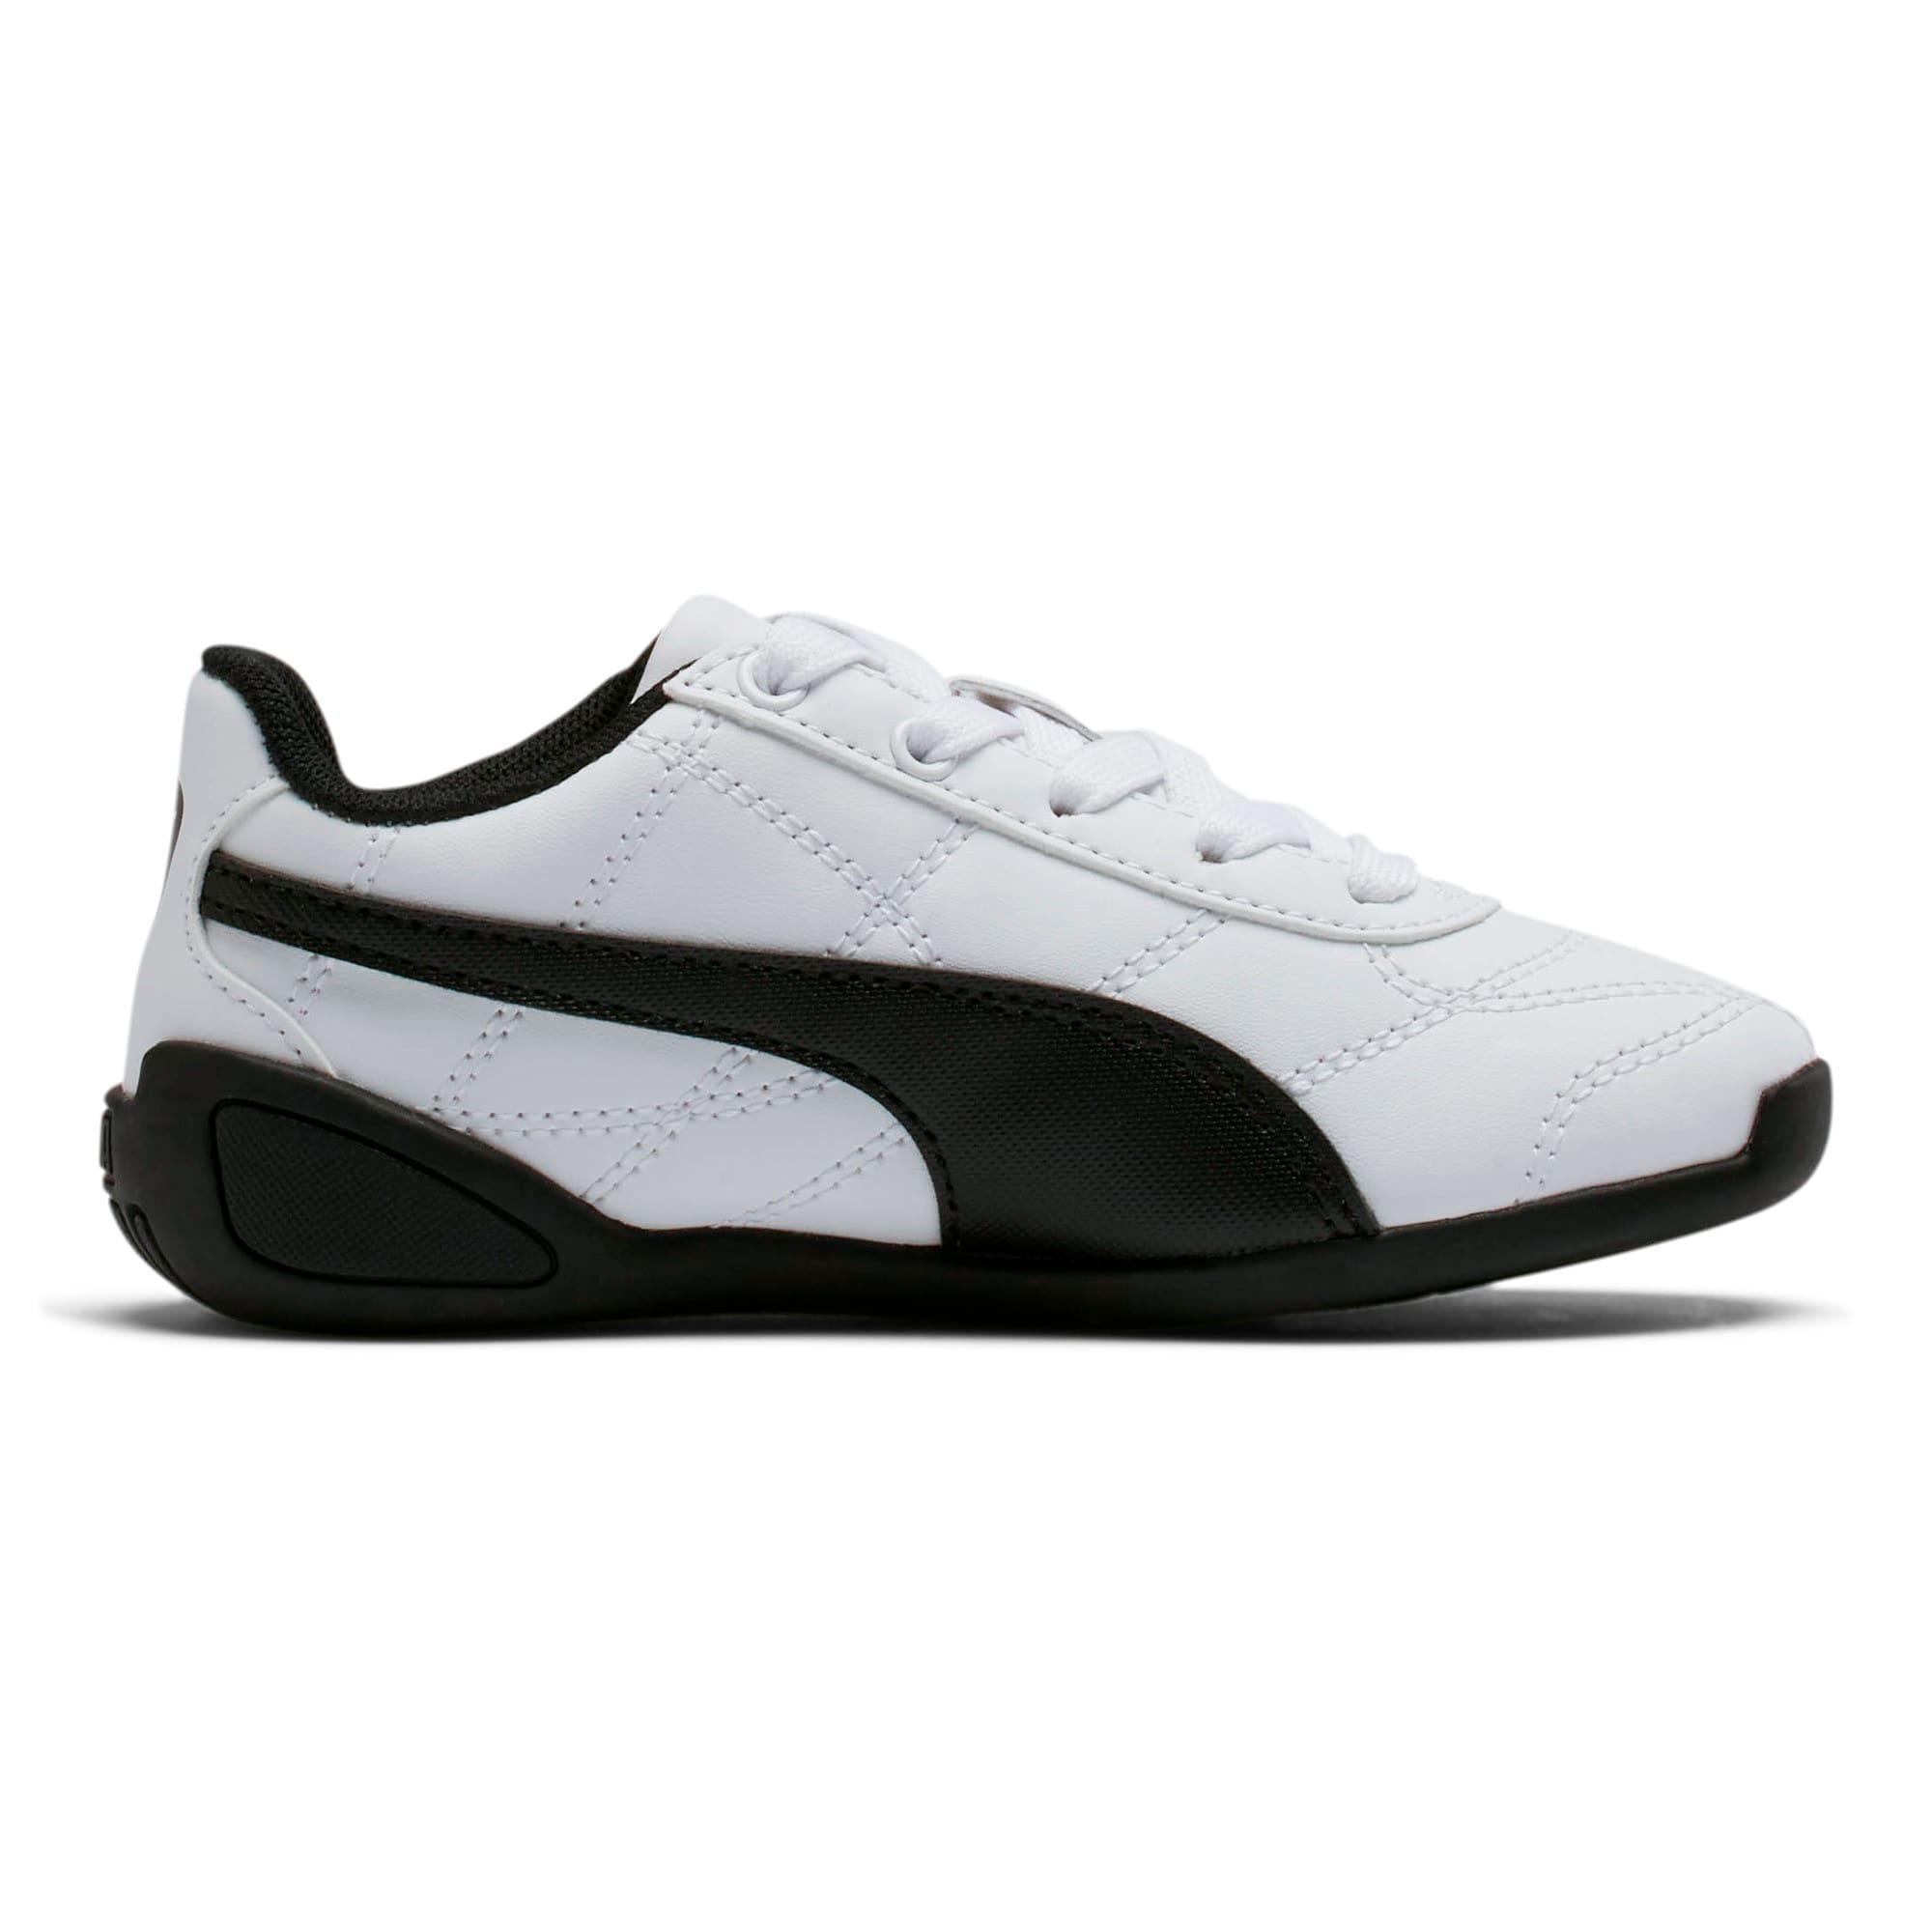 Thumbnail 5 of Tune Cat 3 Little Kids' Shoes, Puma White-Puma Black, medium